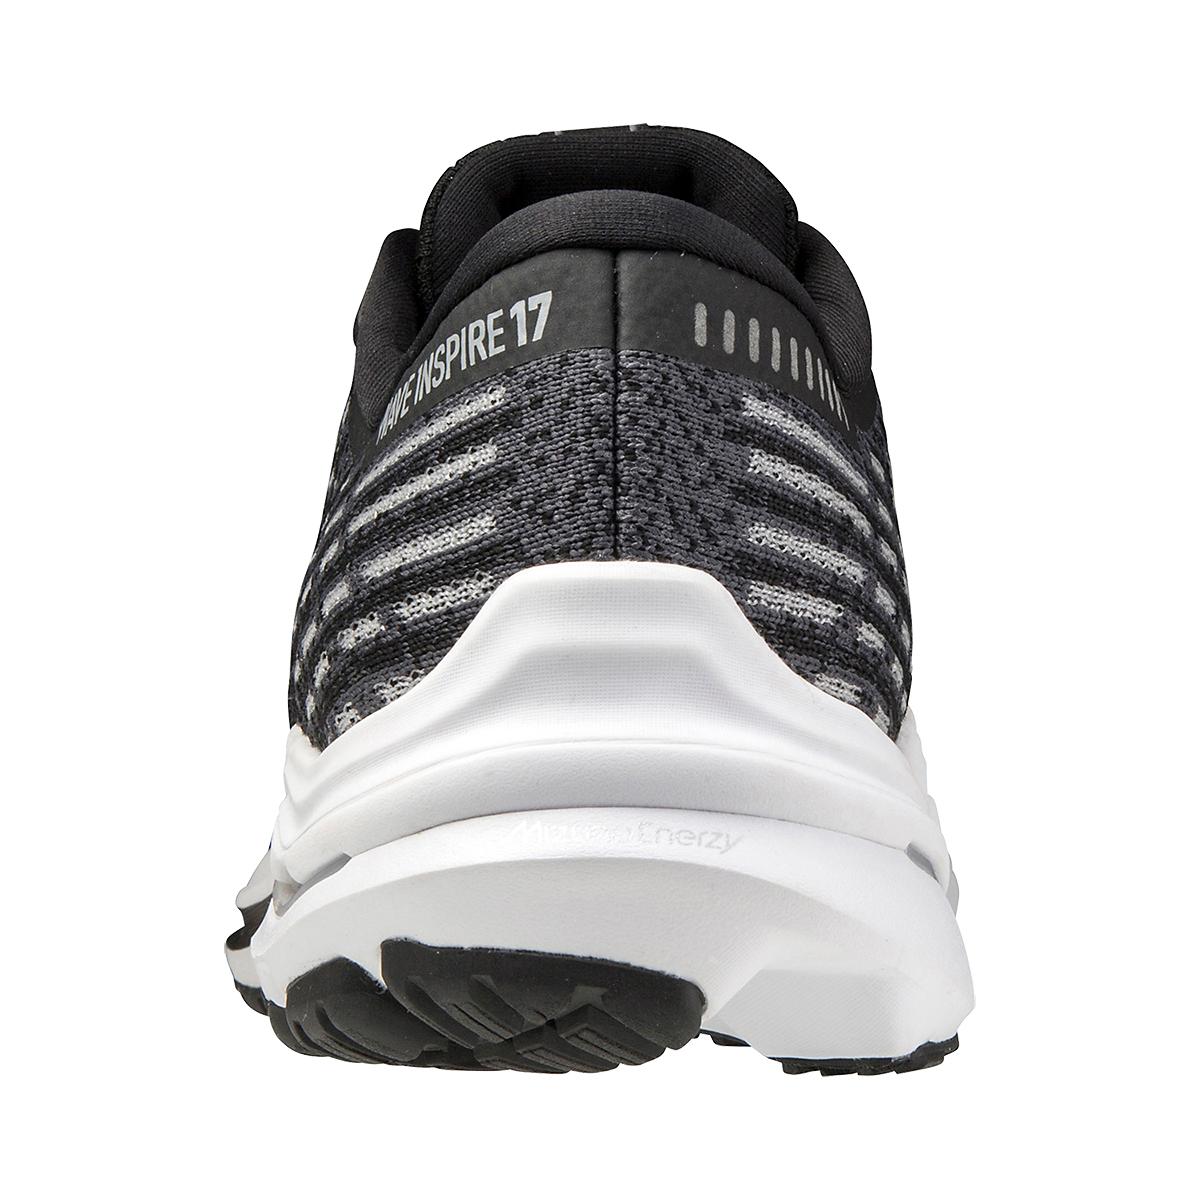 Men's Mizuno Wave Inspire 17 Waveknit Running Shoe - Color: Black/Shade - Size: 7 - Width: Regular, Black/Shade, large, image 3